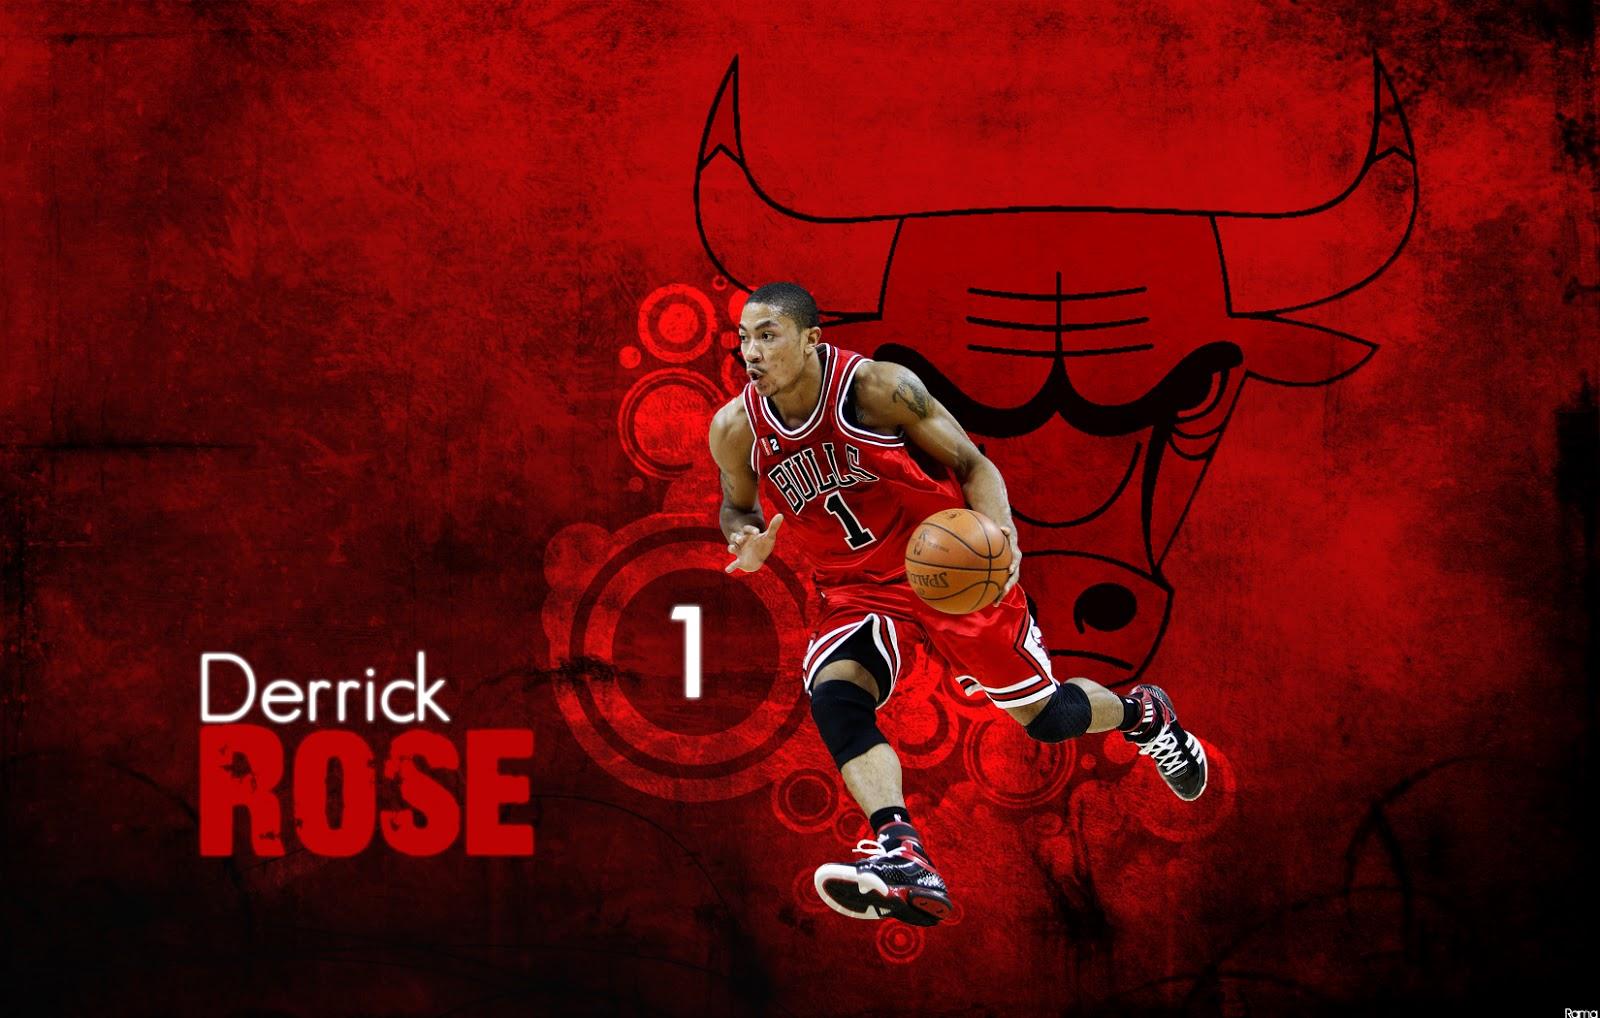 Hd Wallpapers Derrick Rose Nba Chicago Bulls Hd Wallpapers Derick Rose 1600x1018